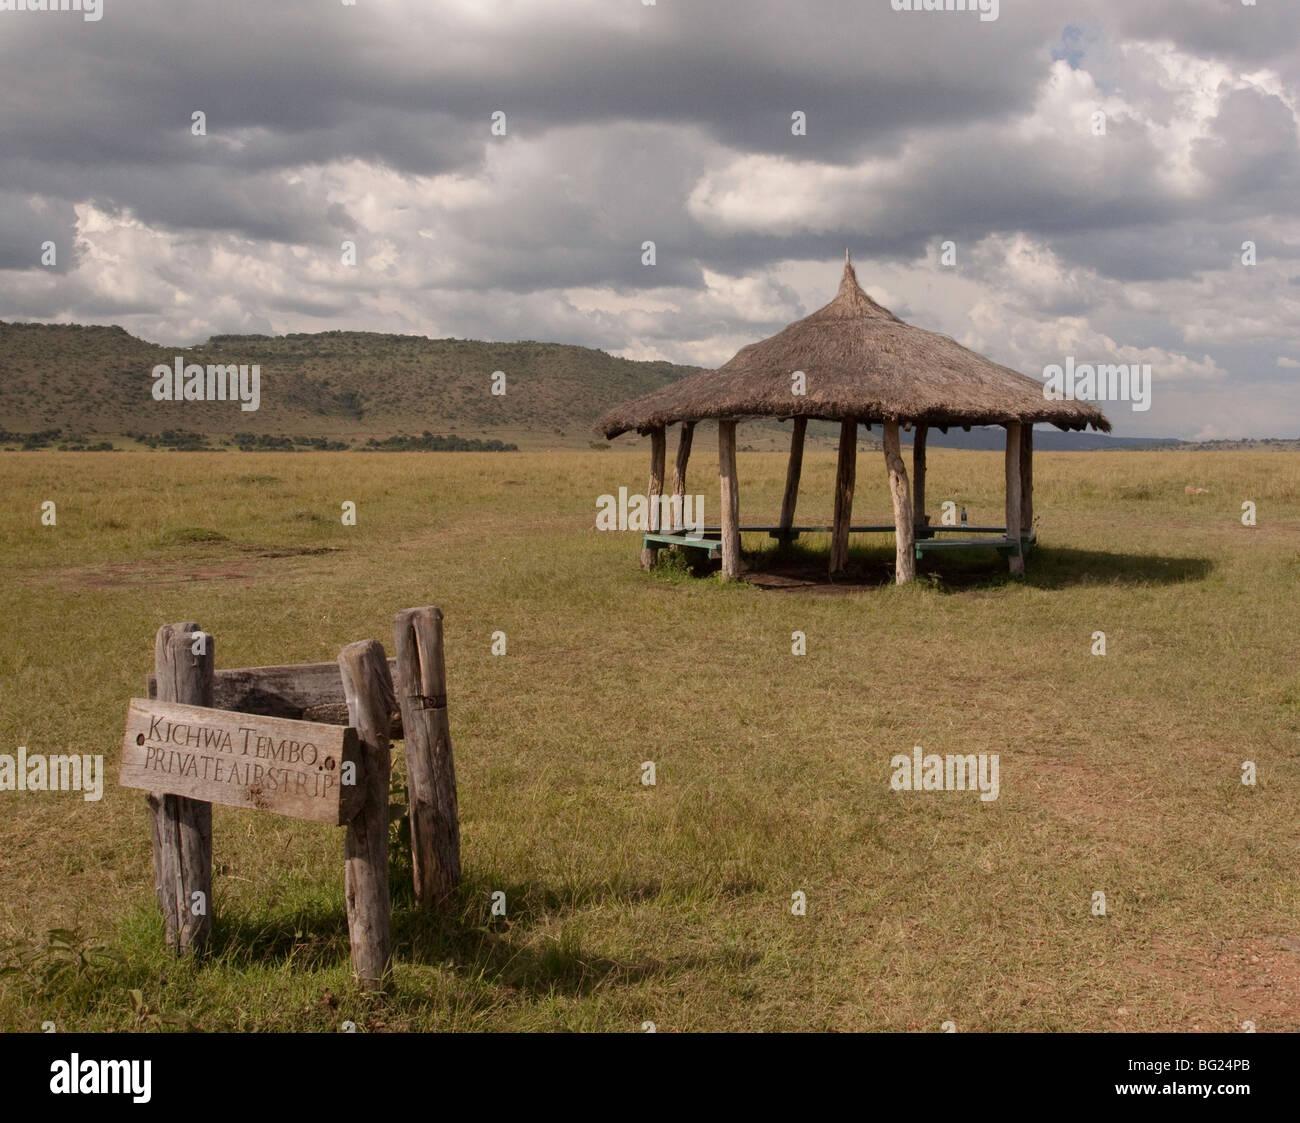 Airstrip in the Masai Mara - Stock Image